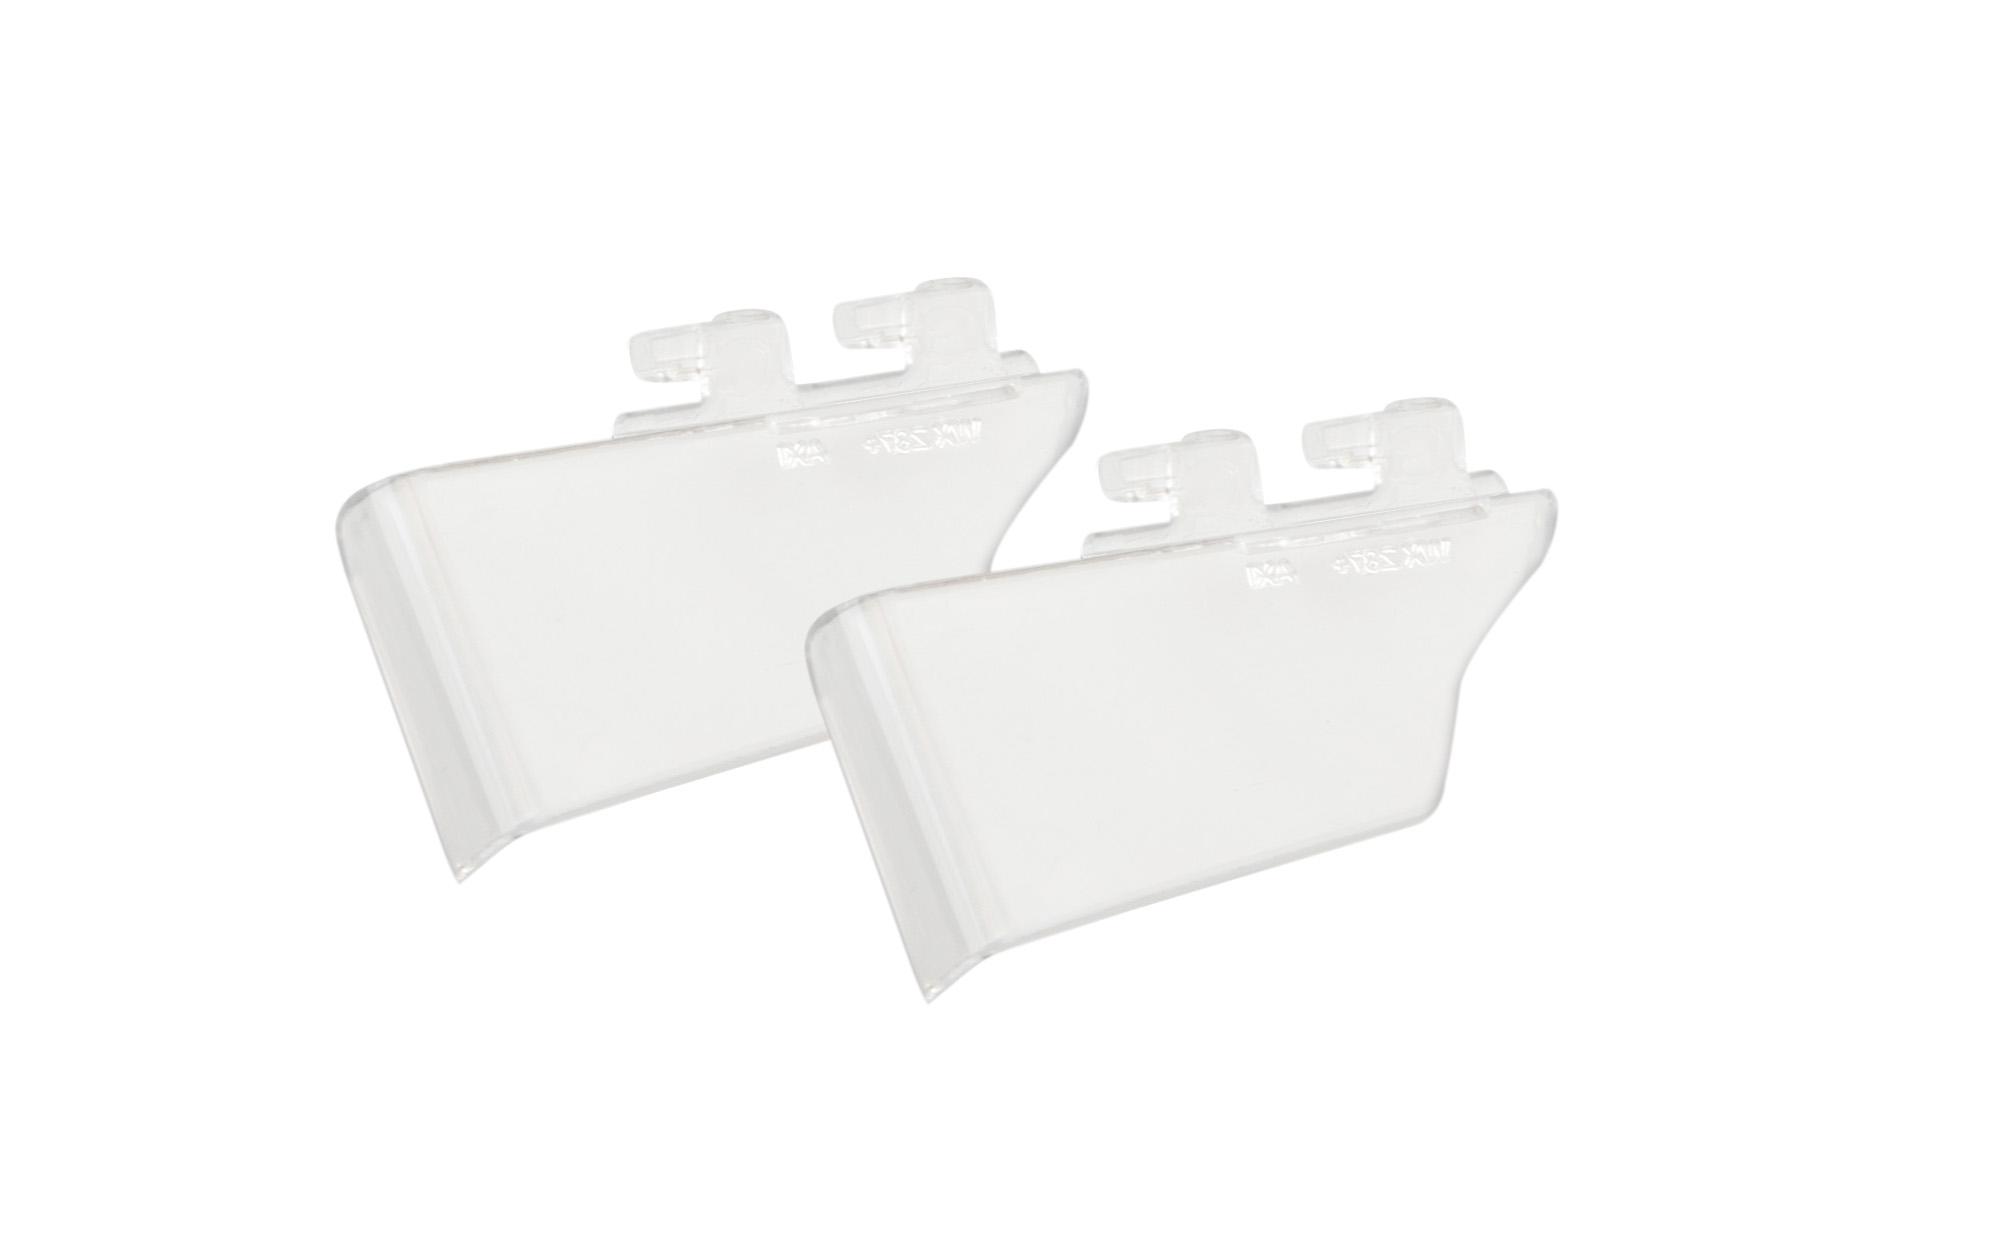 WX Serenity Permanent Shields Image 1